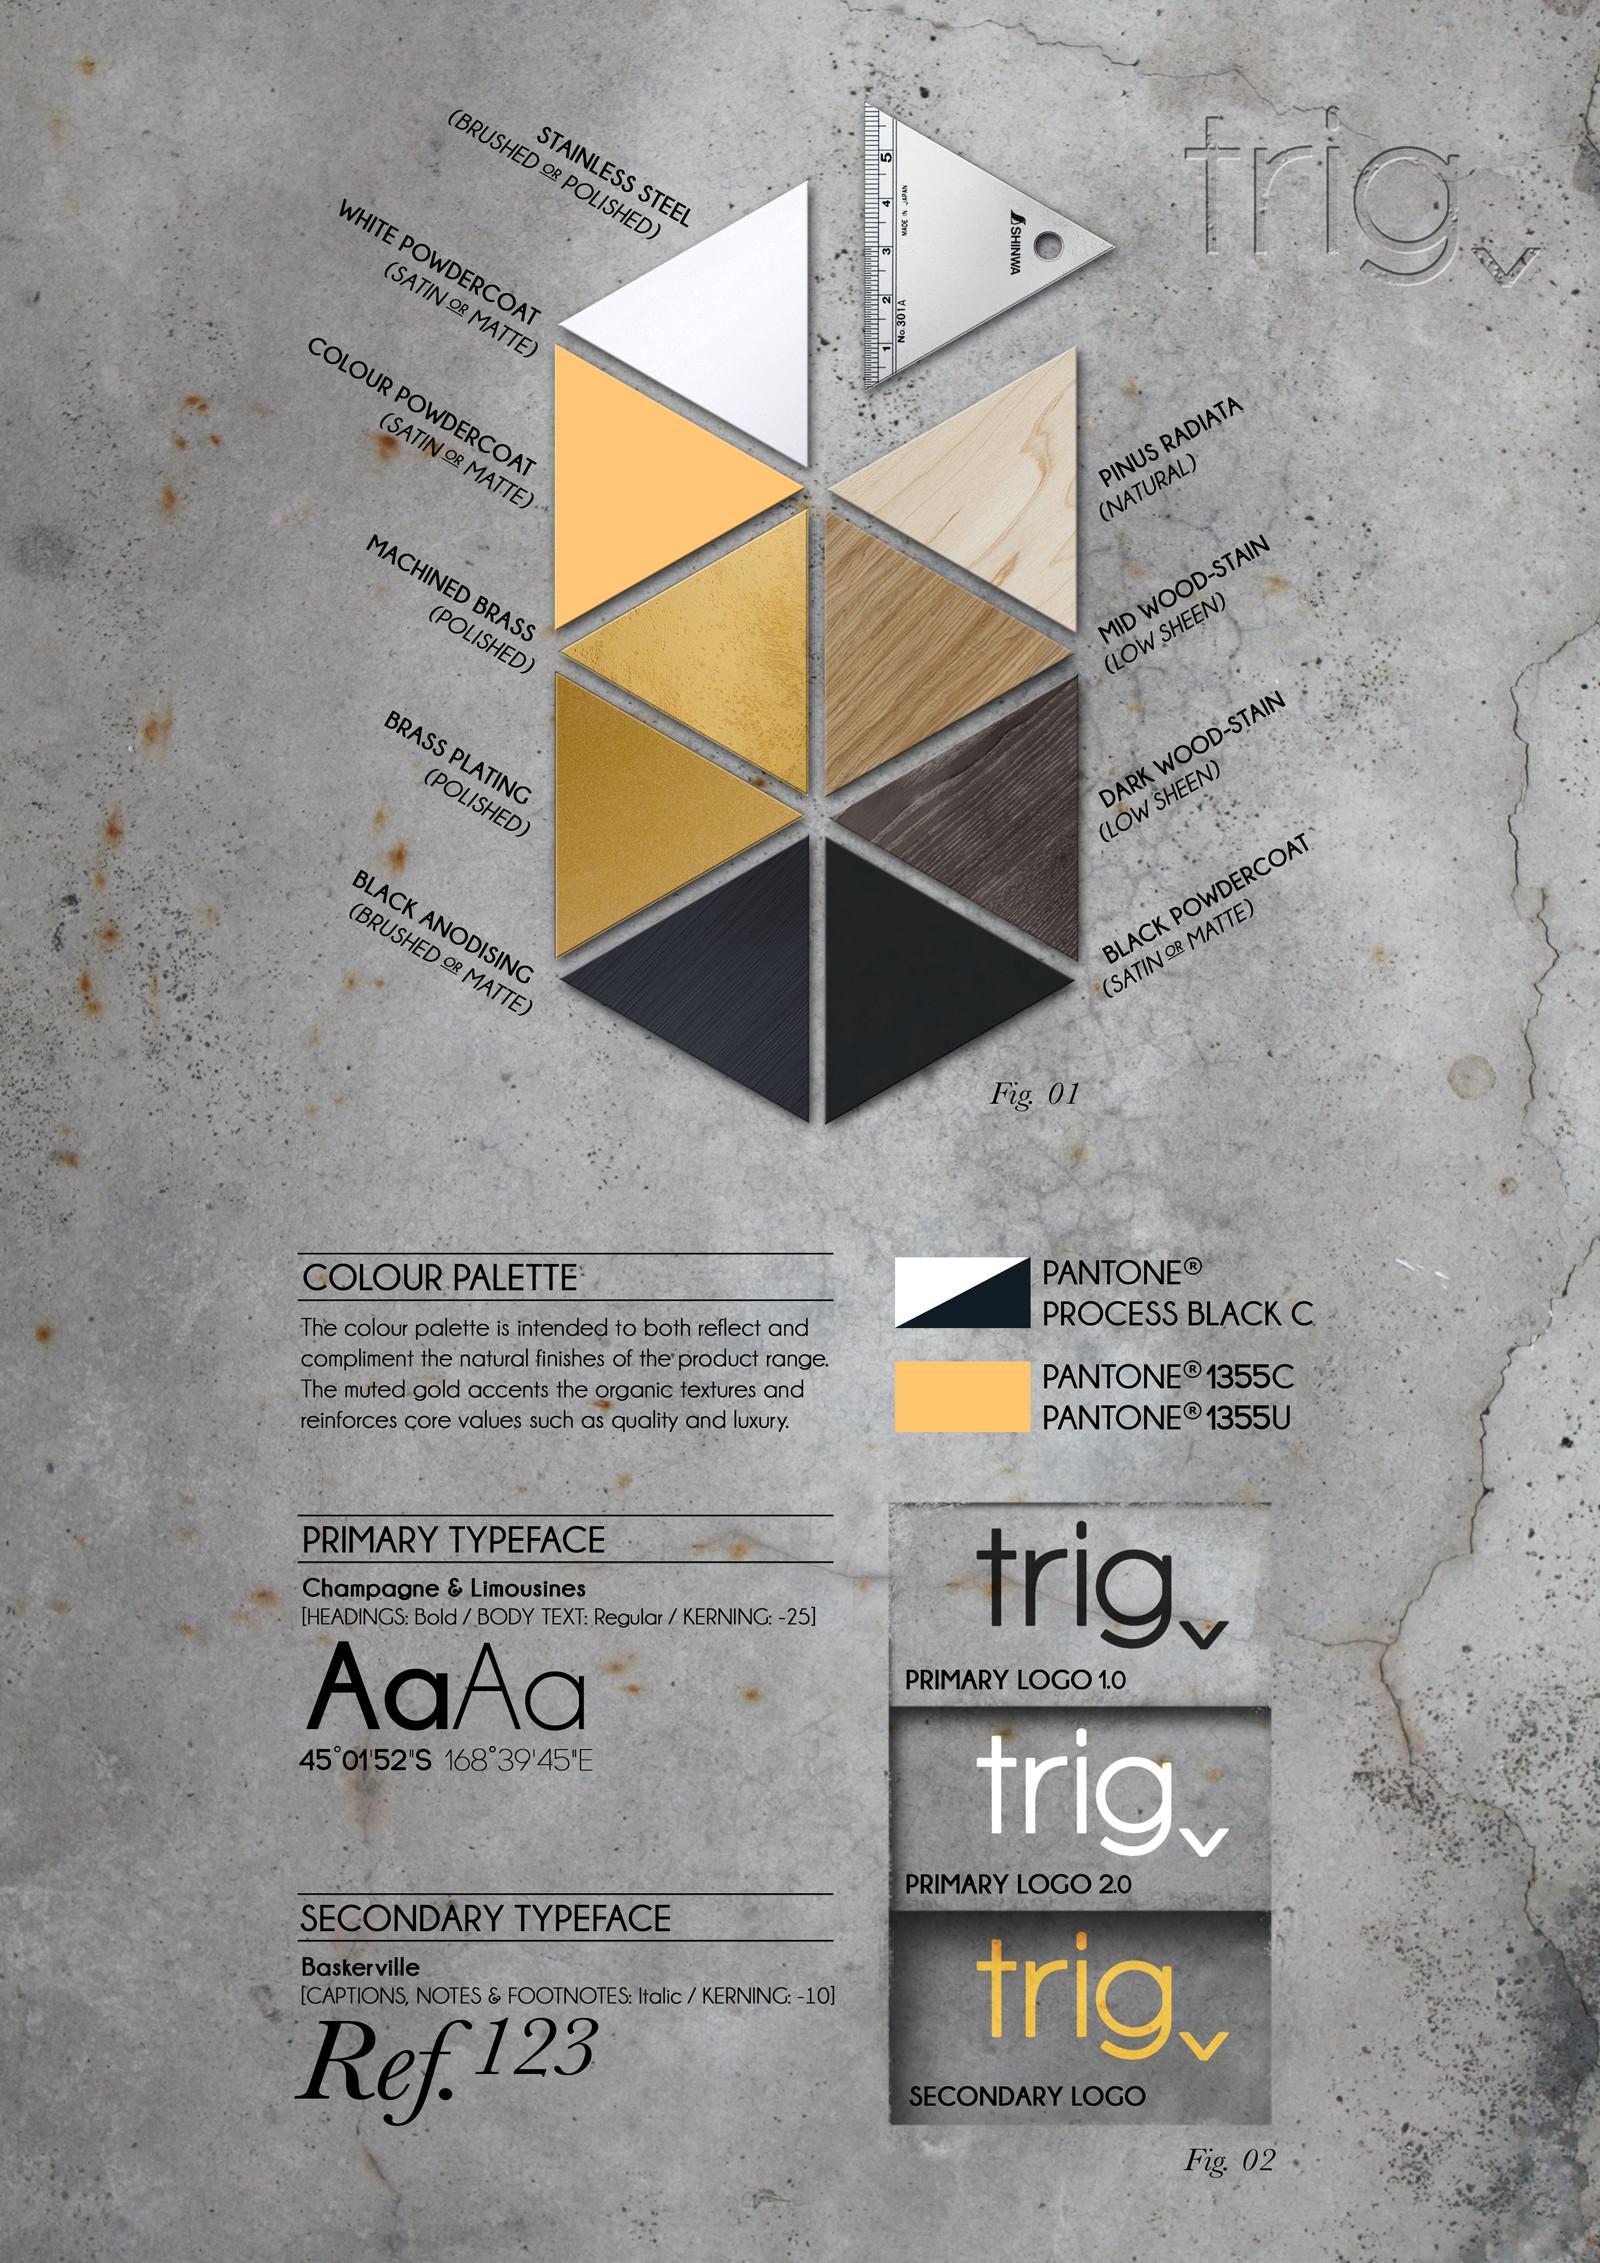 Trig-3.1.jpg